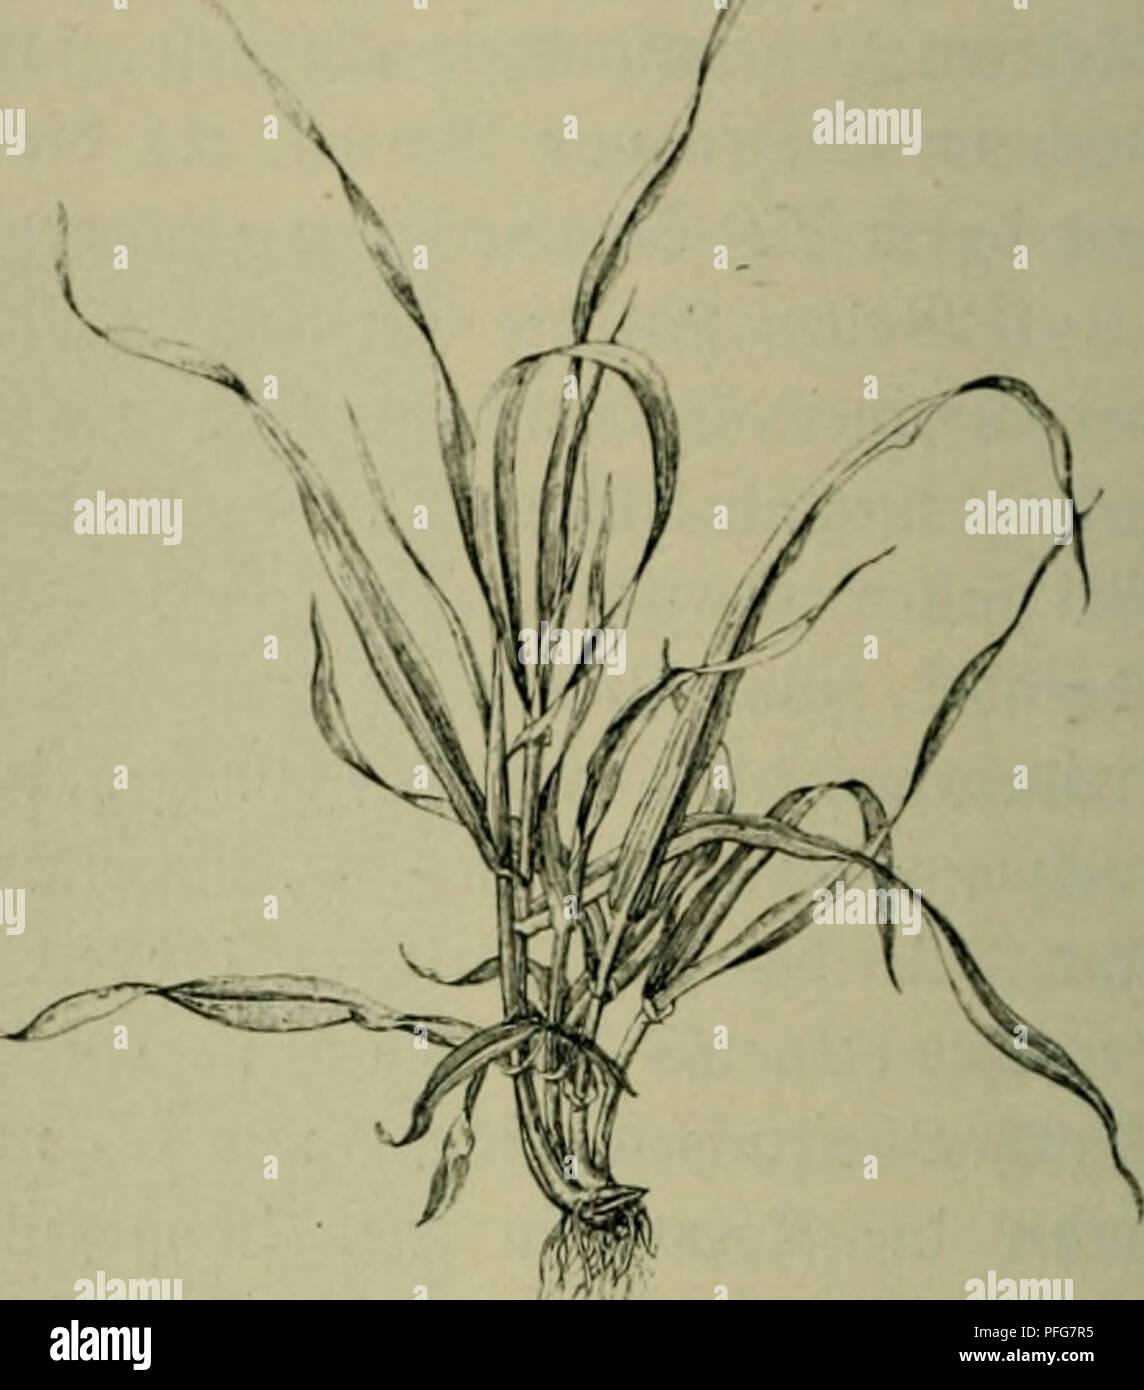 ". Das Leben der Pflanze. Plants; Plants; Plants; Phytogeography. 9Ibli. :u. (Serfte (5rül)e (8olßtl)orpe). ^^cftocfung. (Hfirt)ii'i»9 iHin 9J. Ceffingev.» liefern ein jur Fütterung geeignete^ ©trol), bn5 bei ben ©ommerformen mihx ge» fcf)äl3t mirb. ^ie in Sübroeftafien, nad) neuen ^unben aber oud) in 'Oiorbafrifa n)ilb = n)arf)fenbc®erftc mit 5erbved)lid)er ©pinbel (Hordeuni spontaneum C ^od)) fe()en .^""^od) unb ilörnicfe qI§ Stammform unfcrcv ©erftcn nn. C^emifi i[t, baJ3 (>)er[te lüie ^öeijcn fef)r alte ^ulturpflanjen finb, bcren erfte ^ulli= uierung [id), eben megcn it)re§ f)of)en 5 - Stock Image"